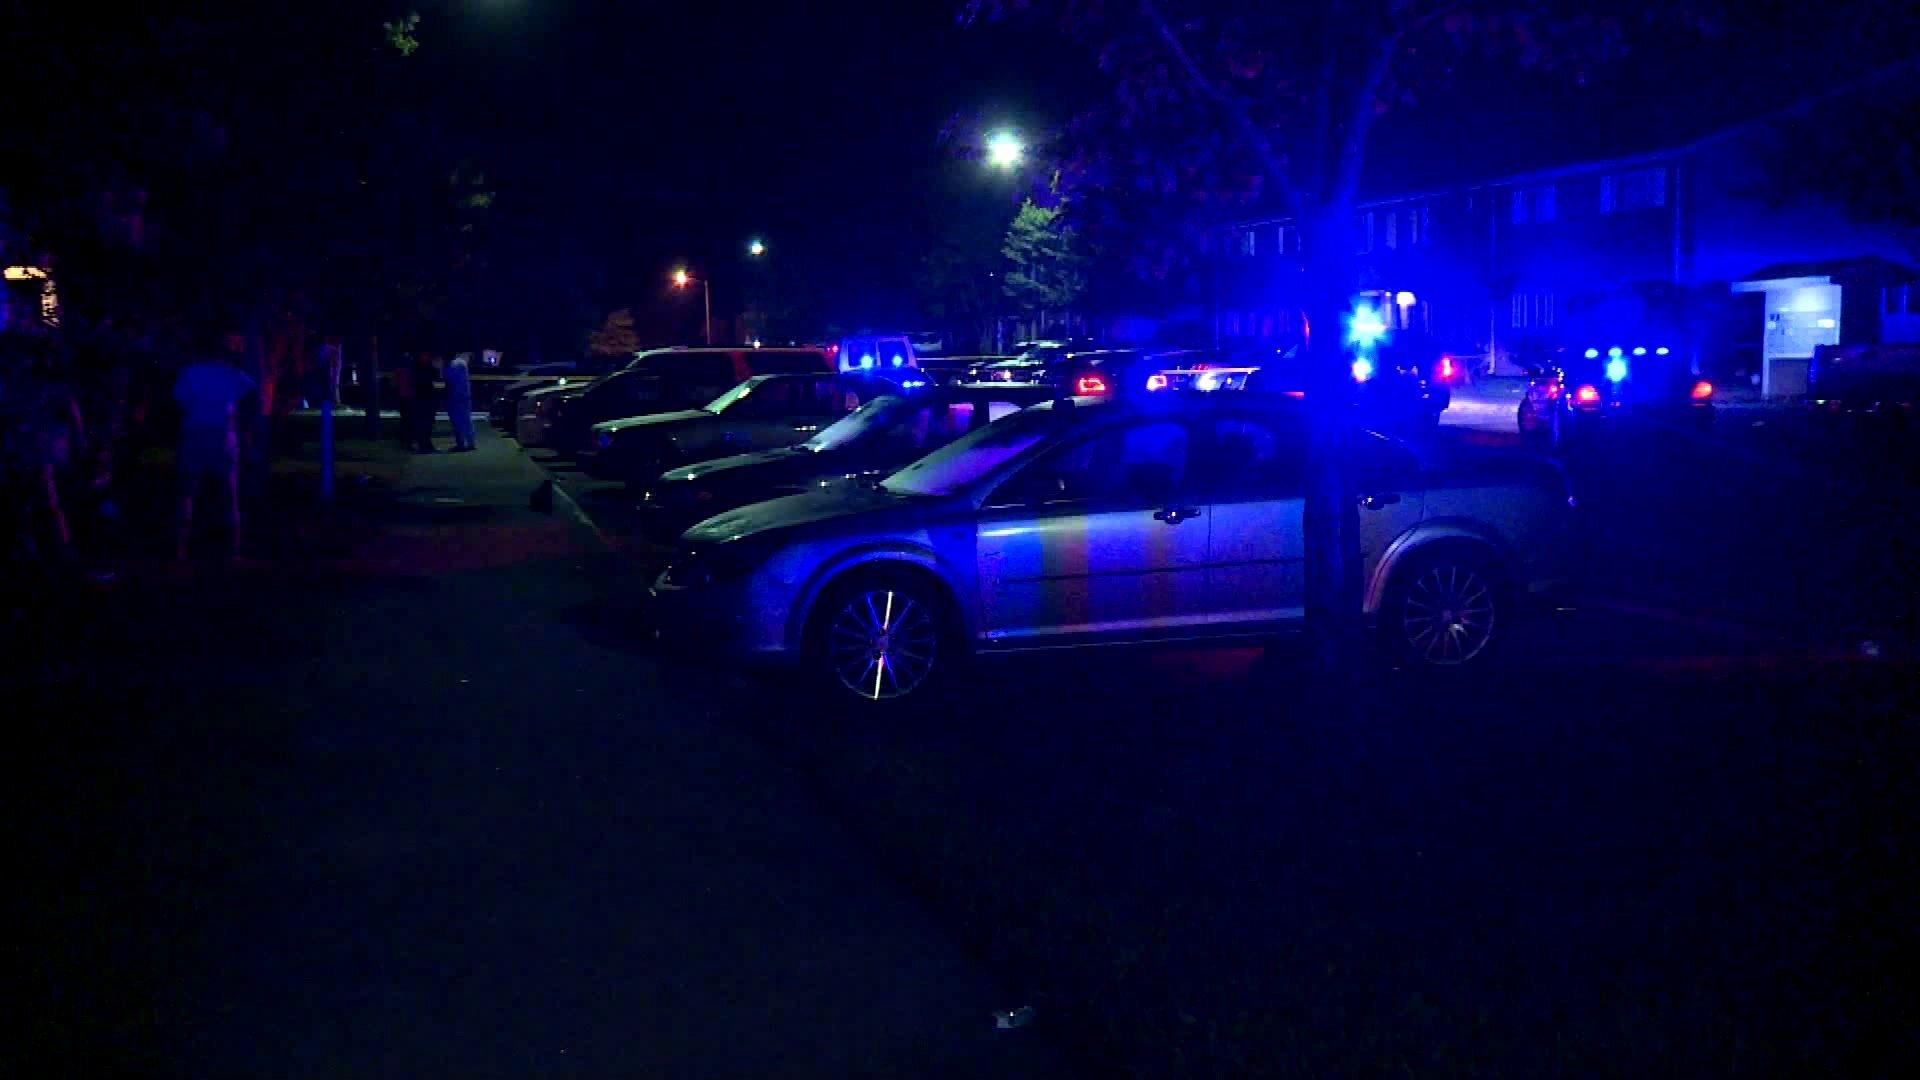 Photos: Man killed in Petersburg doubleshooting